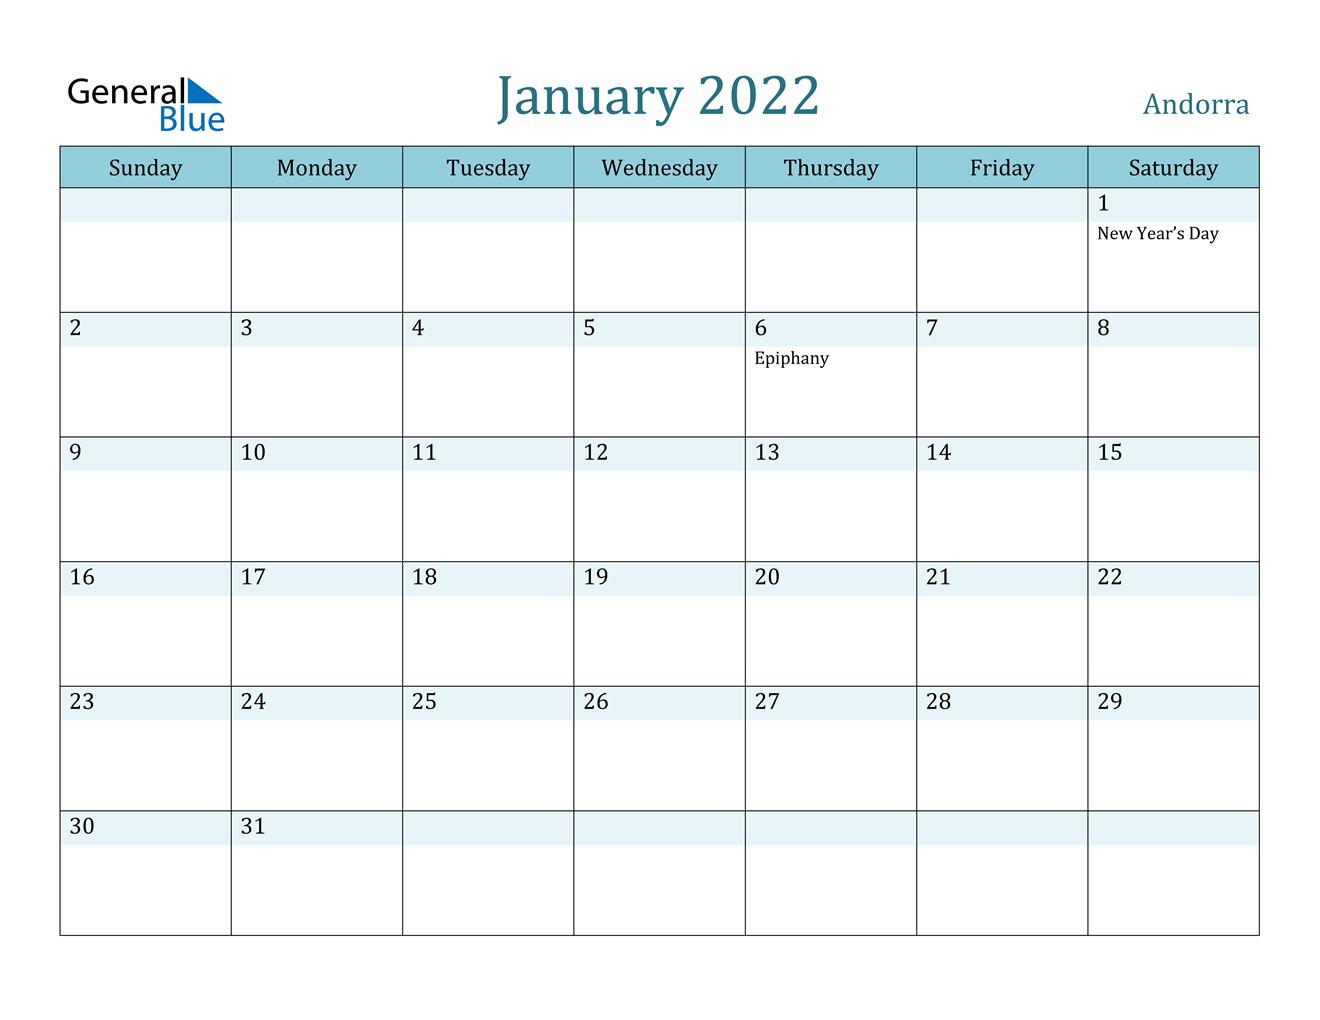 Andorra January 2022 Calendar With Holidays within January 2022 Printable Calendar Photo